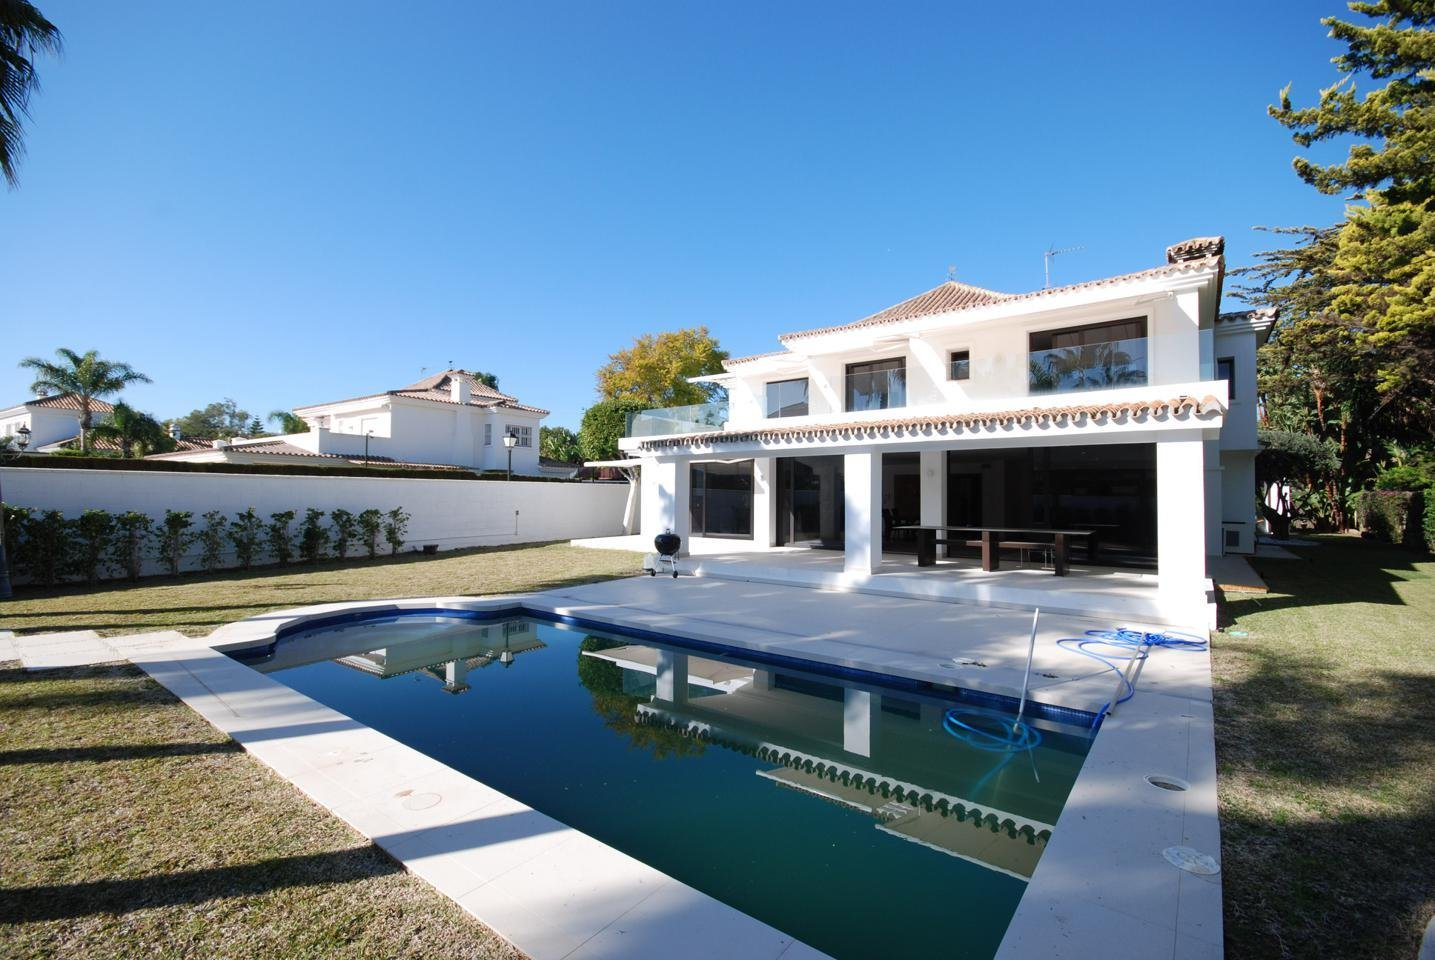 Villa in Atalaya Isdabe, Andalusia, Spain 1 - 10983608